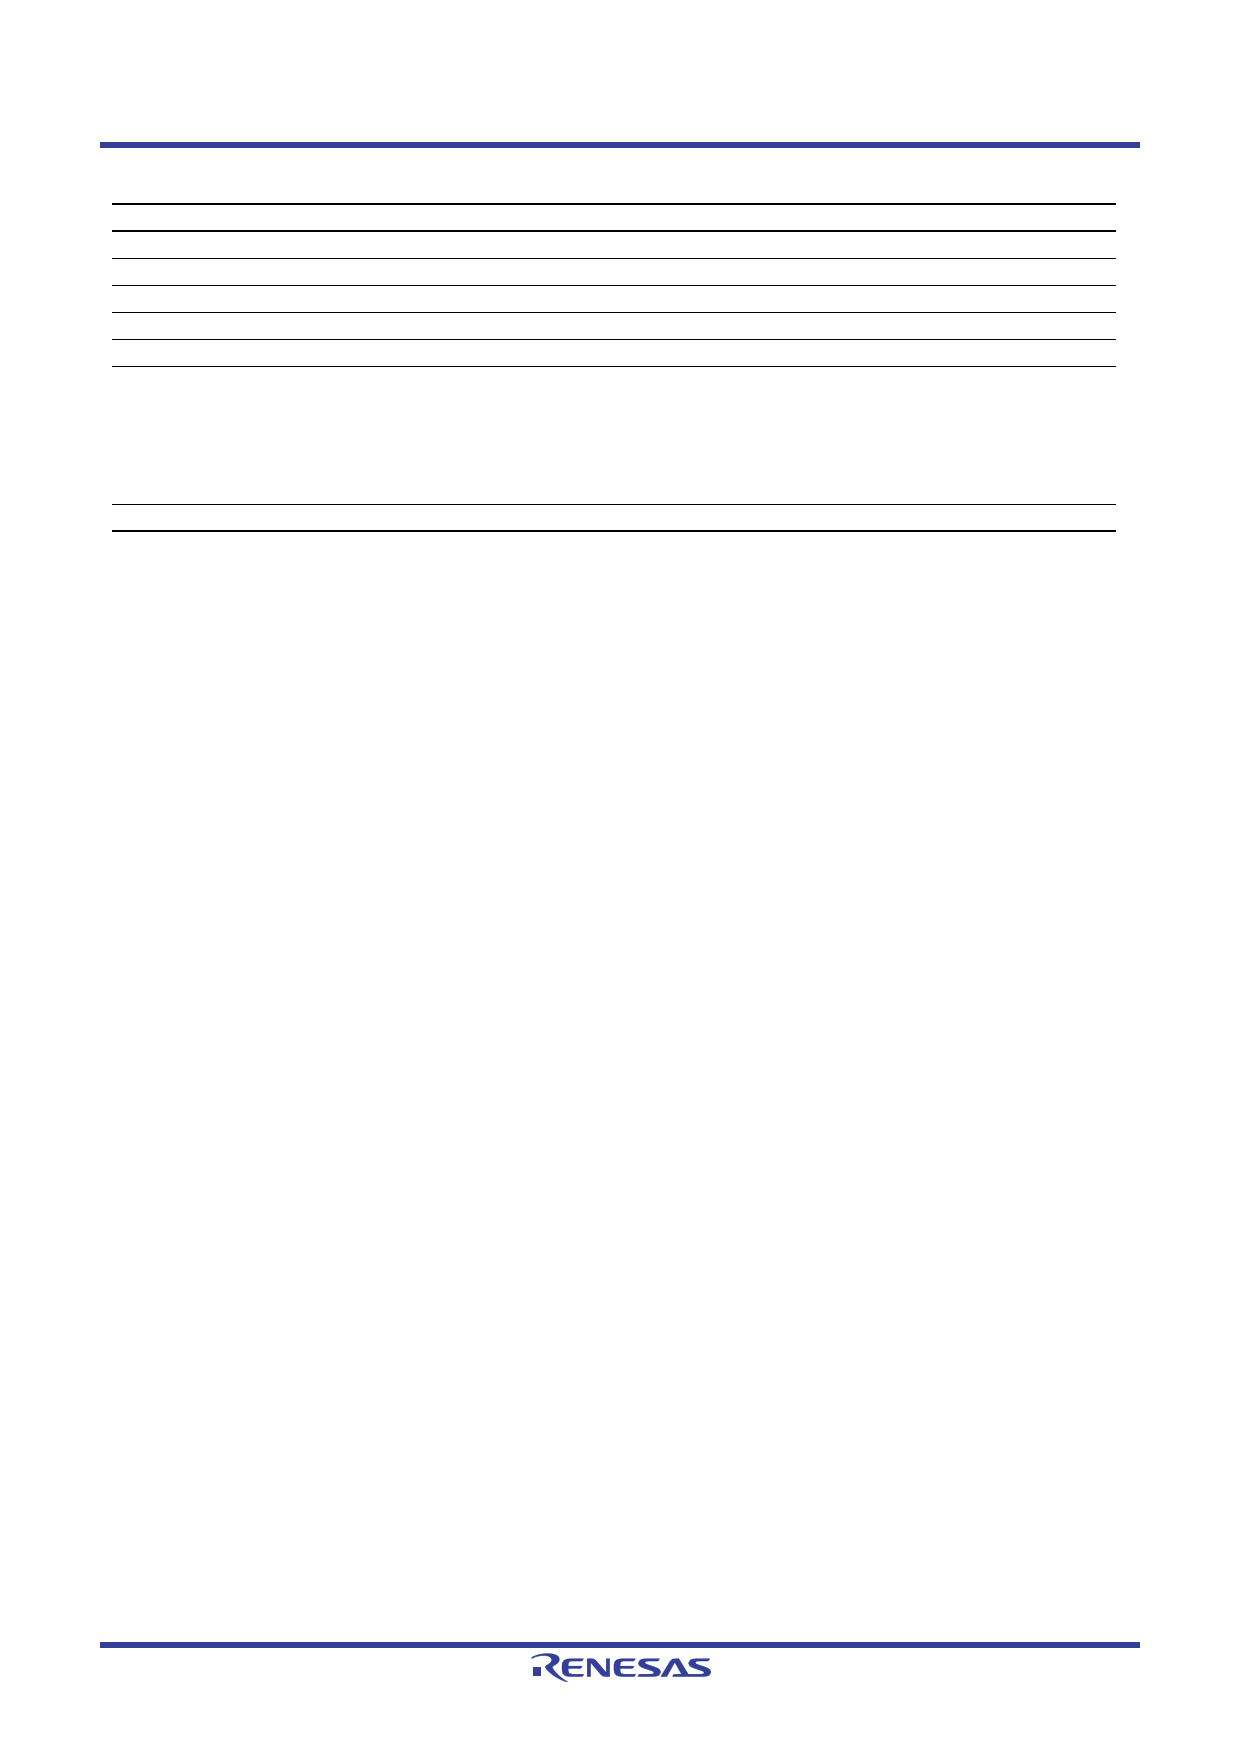 R5F51104ADFM pdf, 반도체, 판매, 대치품